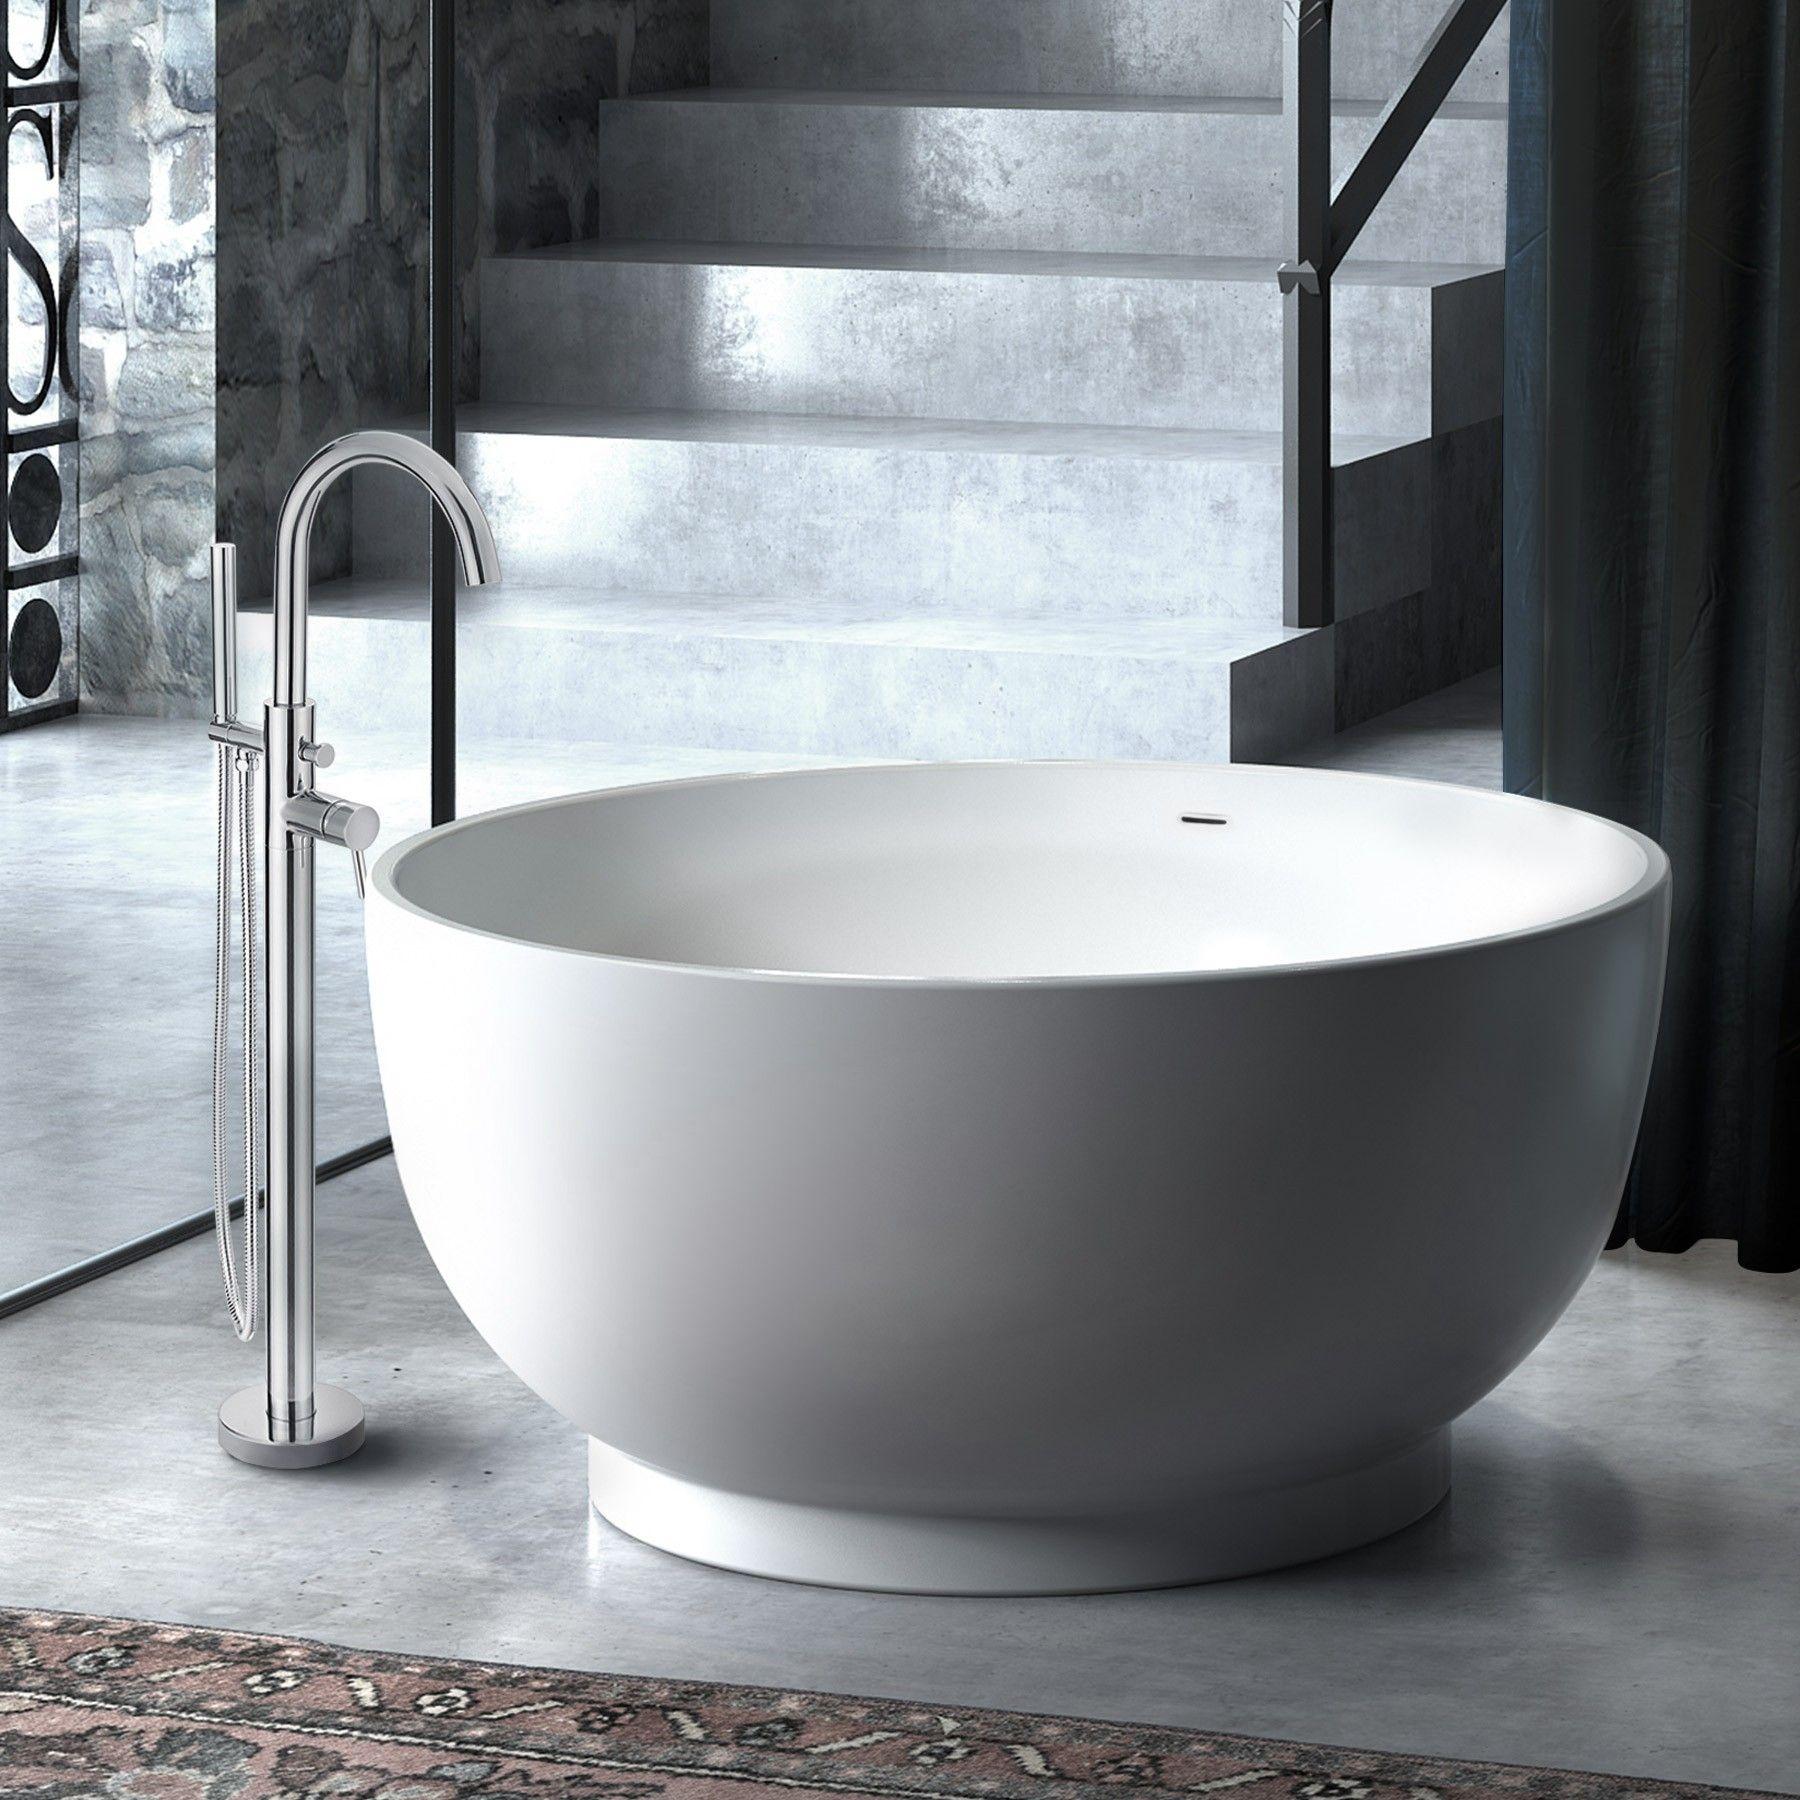 51 Omi Raised Round Acrylic Japanese Soaking Bathtub With Overflow White Japanese Soaking Tubs Freestanding Tub Faucet Soaking Bathtubs